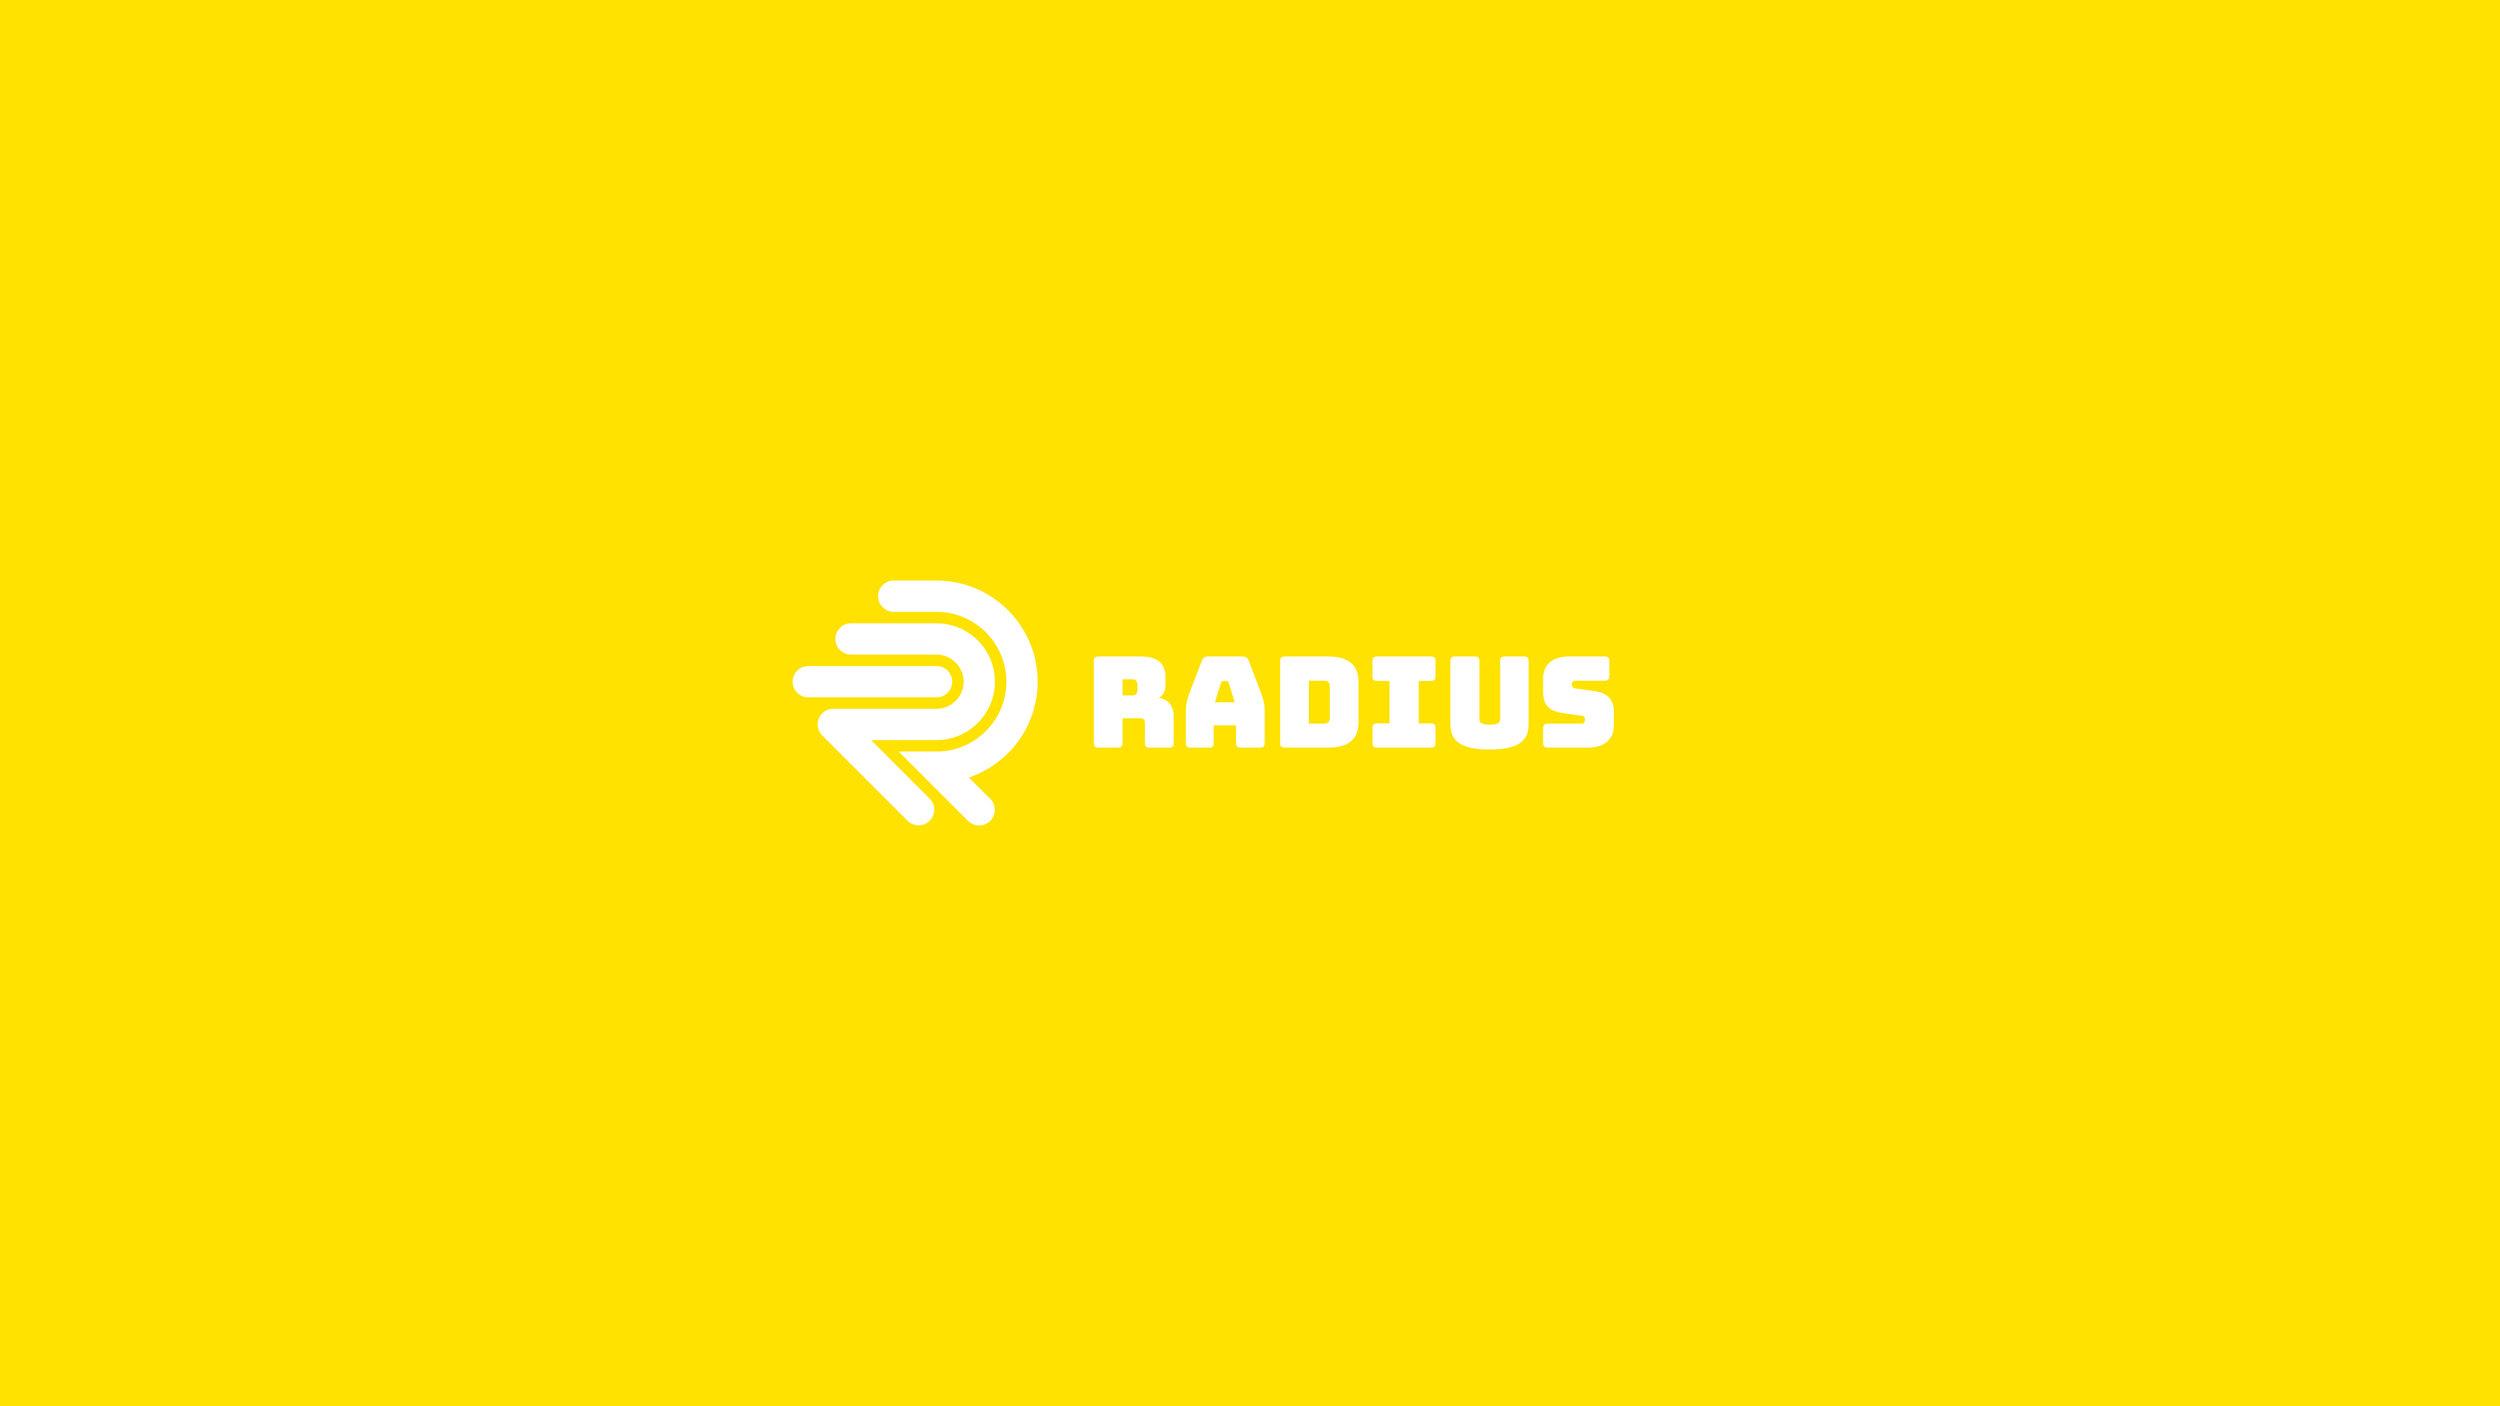 Radius_FinalPresentation03-01.jpg